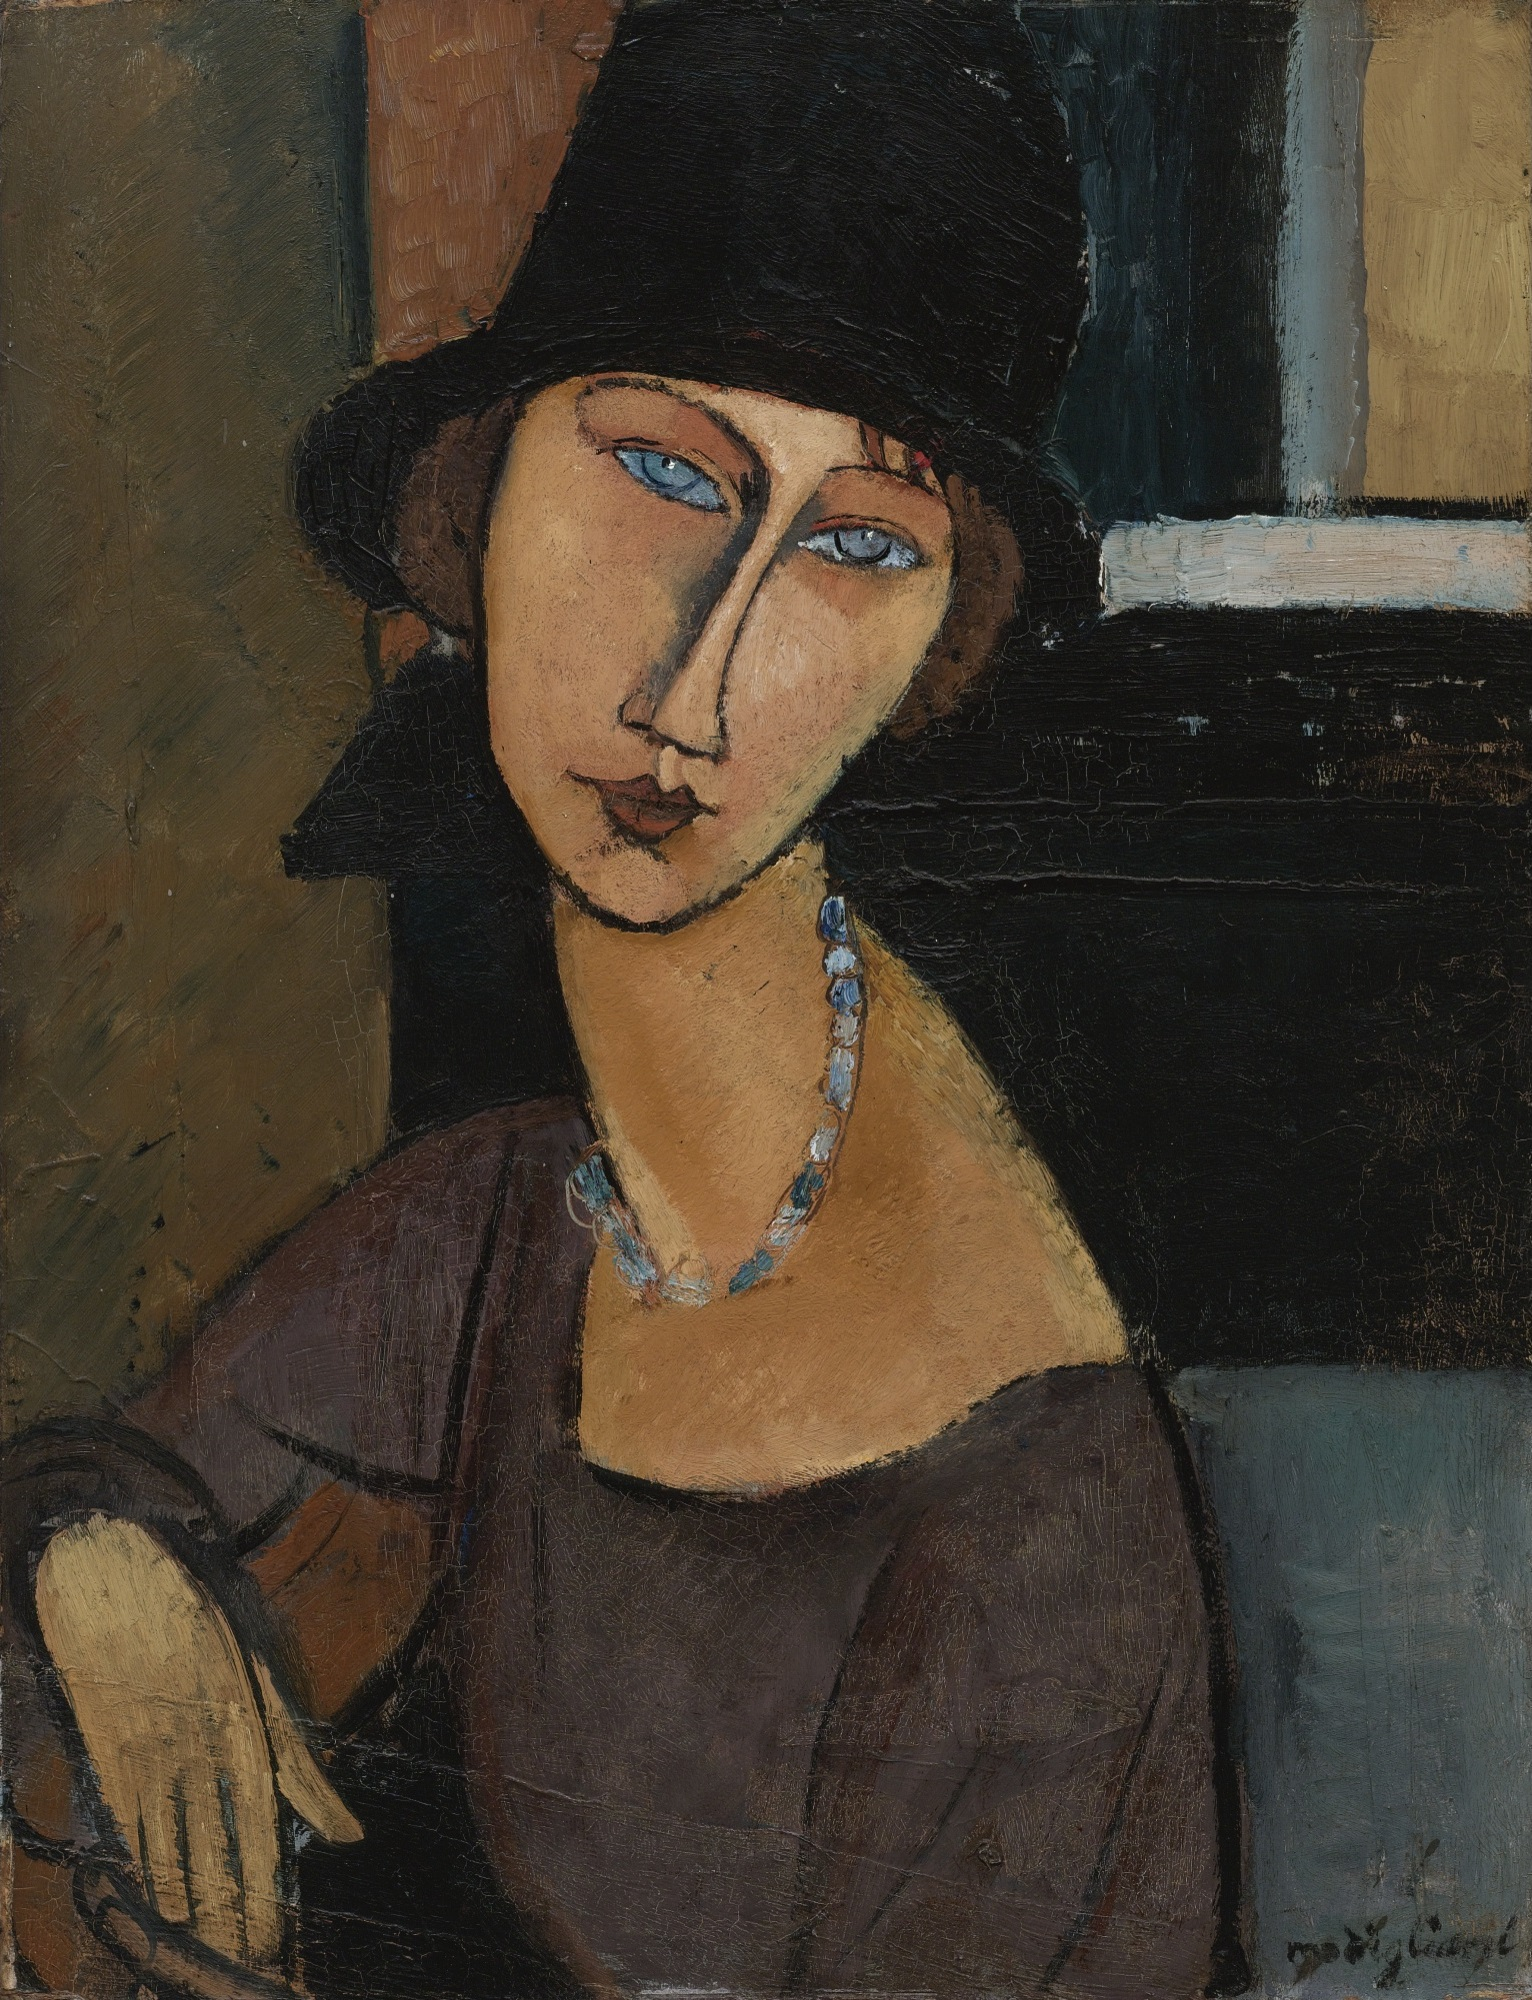 Amedeo Modigliani (1884 - 1920) - Жанна Эбютерн ( в шляпе) / JEANNE HÉBUTERNE (AU CHAPEAU)